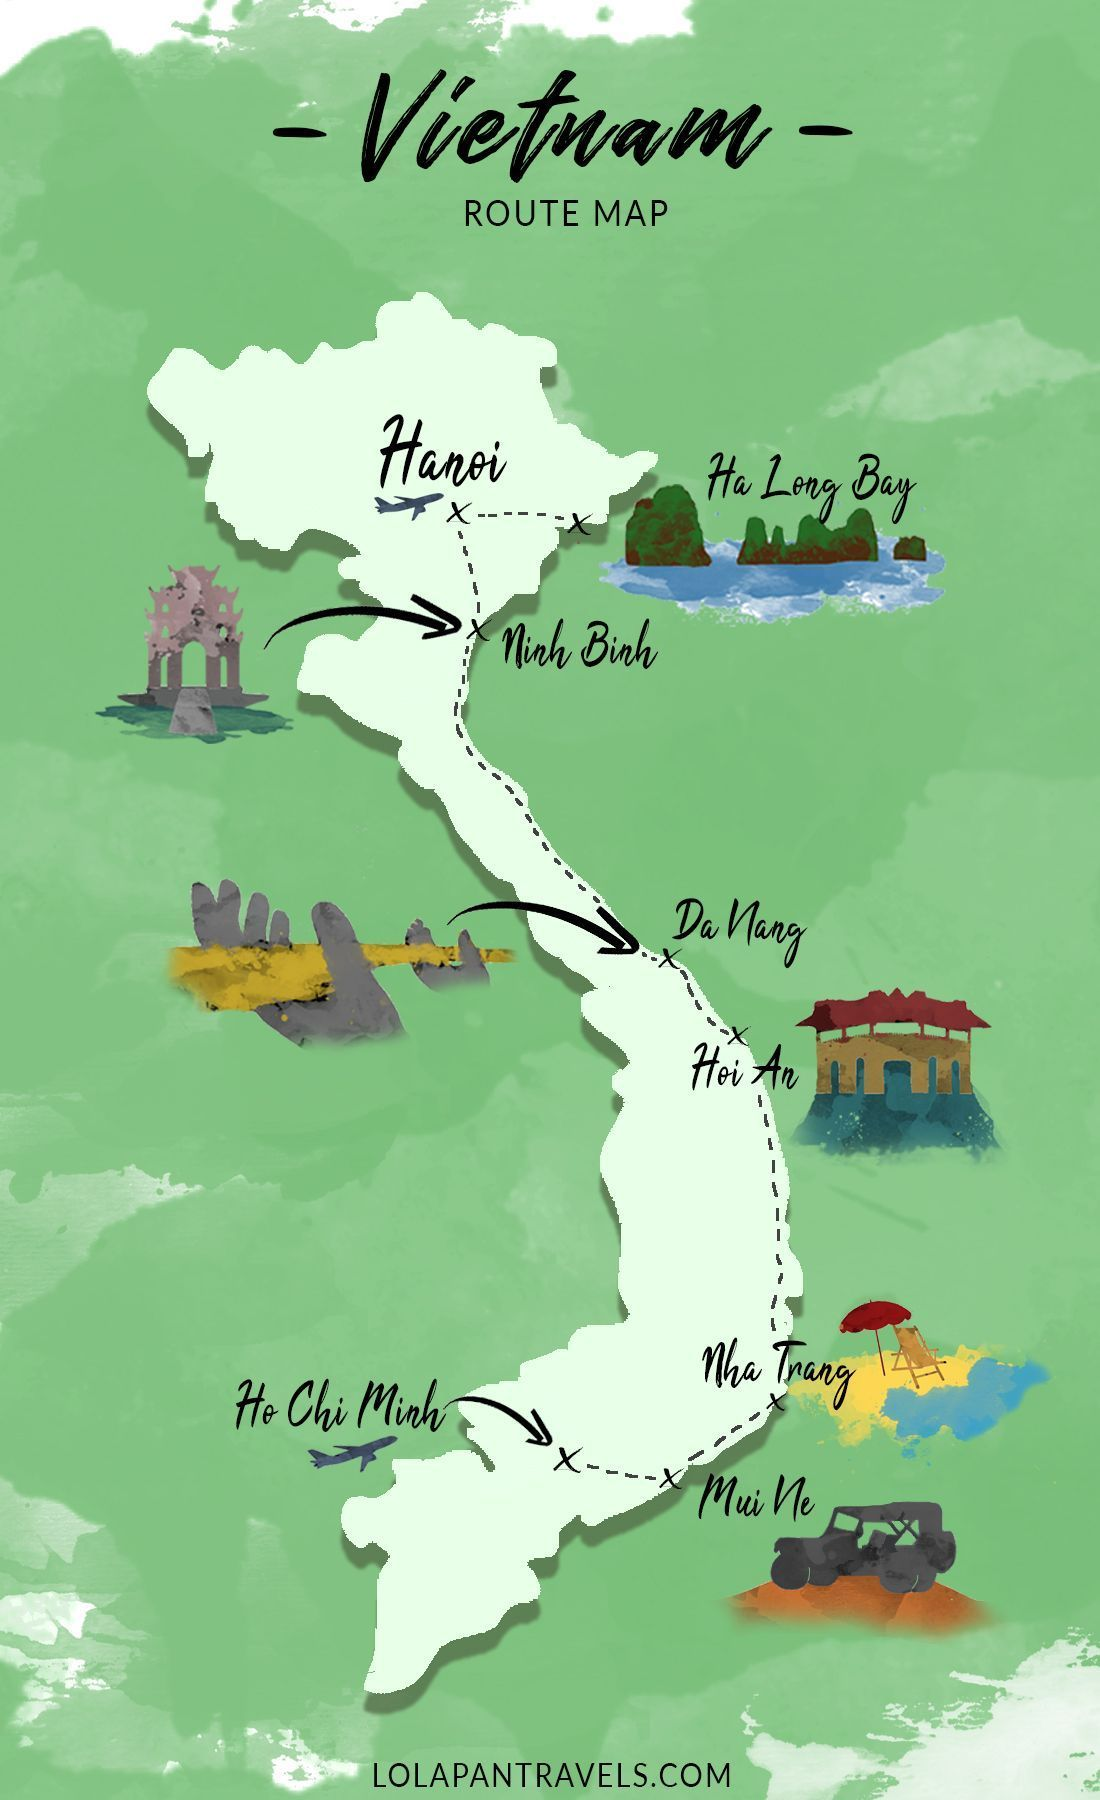 Vietnam Route Map Travel Guide Vietnam Karte Routenkarte